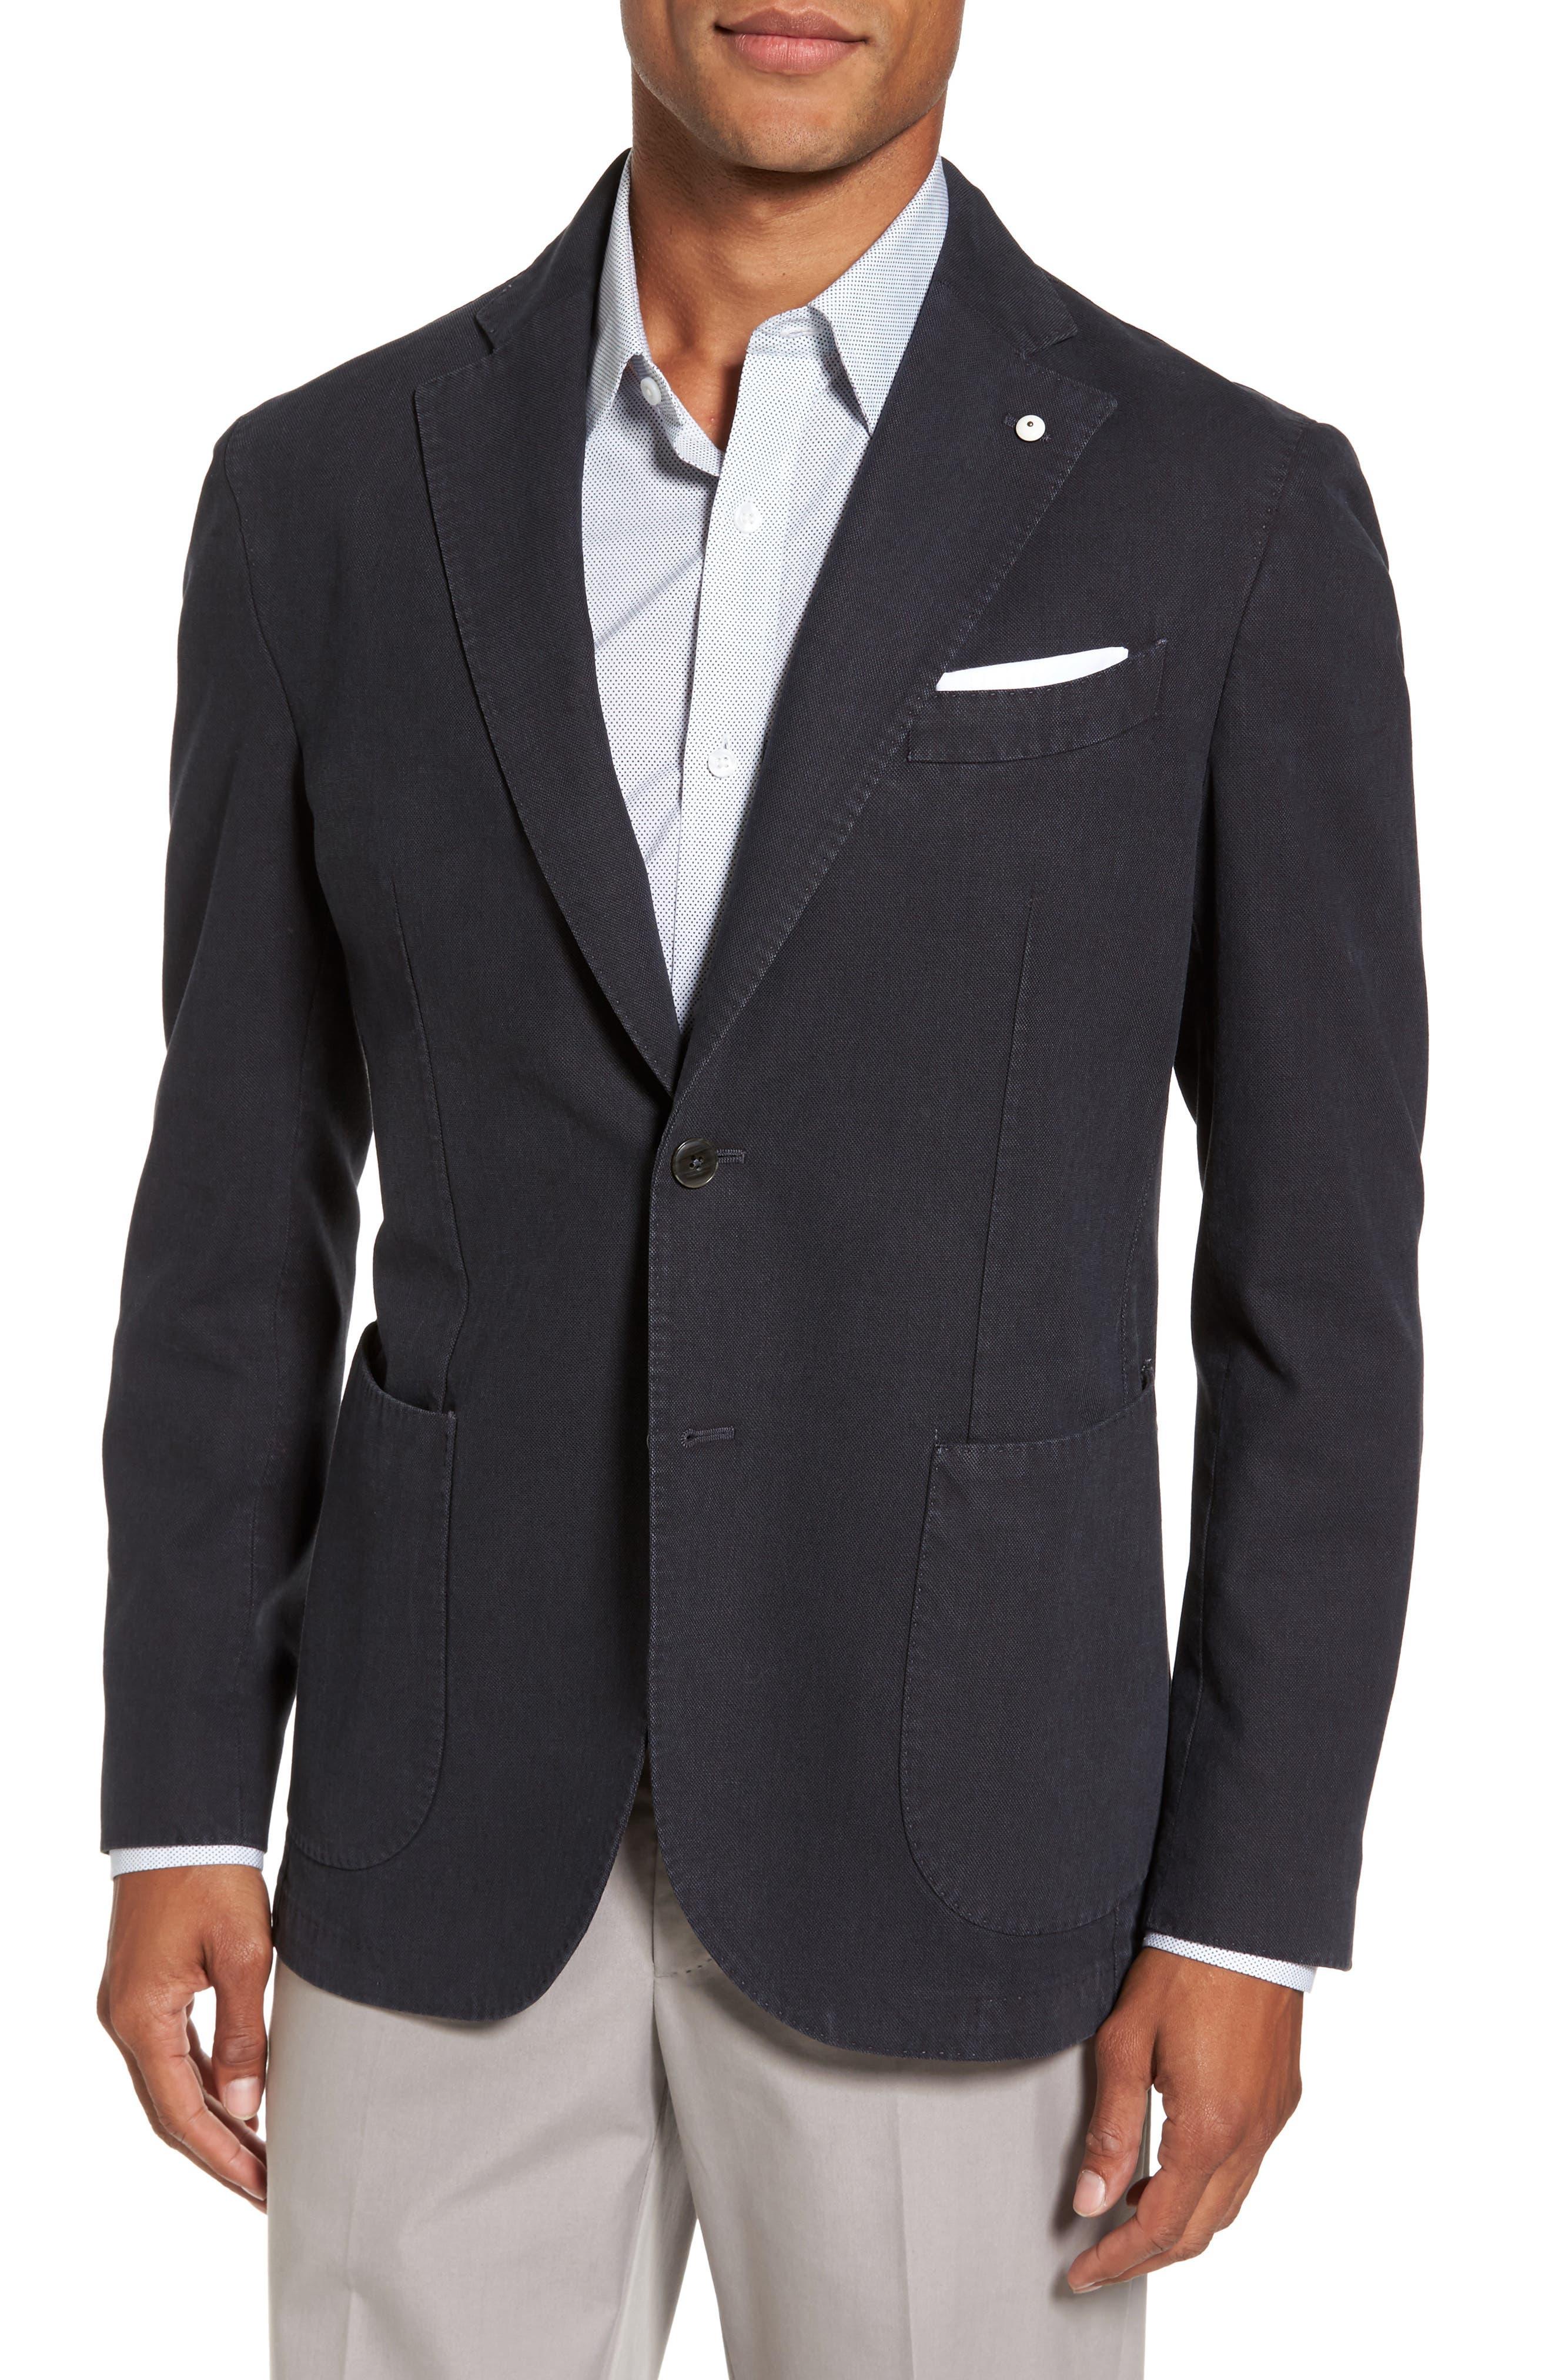 Alternate Image 1 Selected - L.B.M. 1911 Classic Fit Cotton Blend Blazer